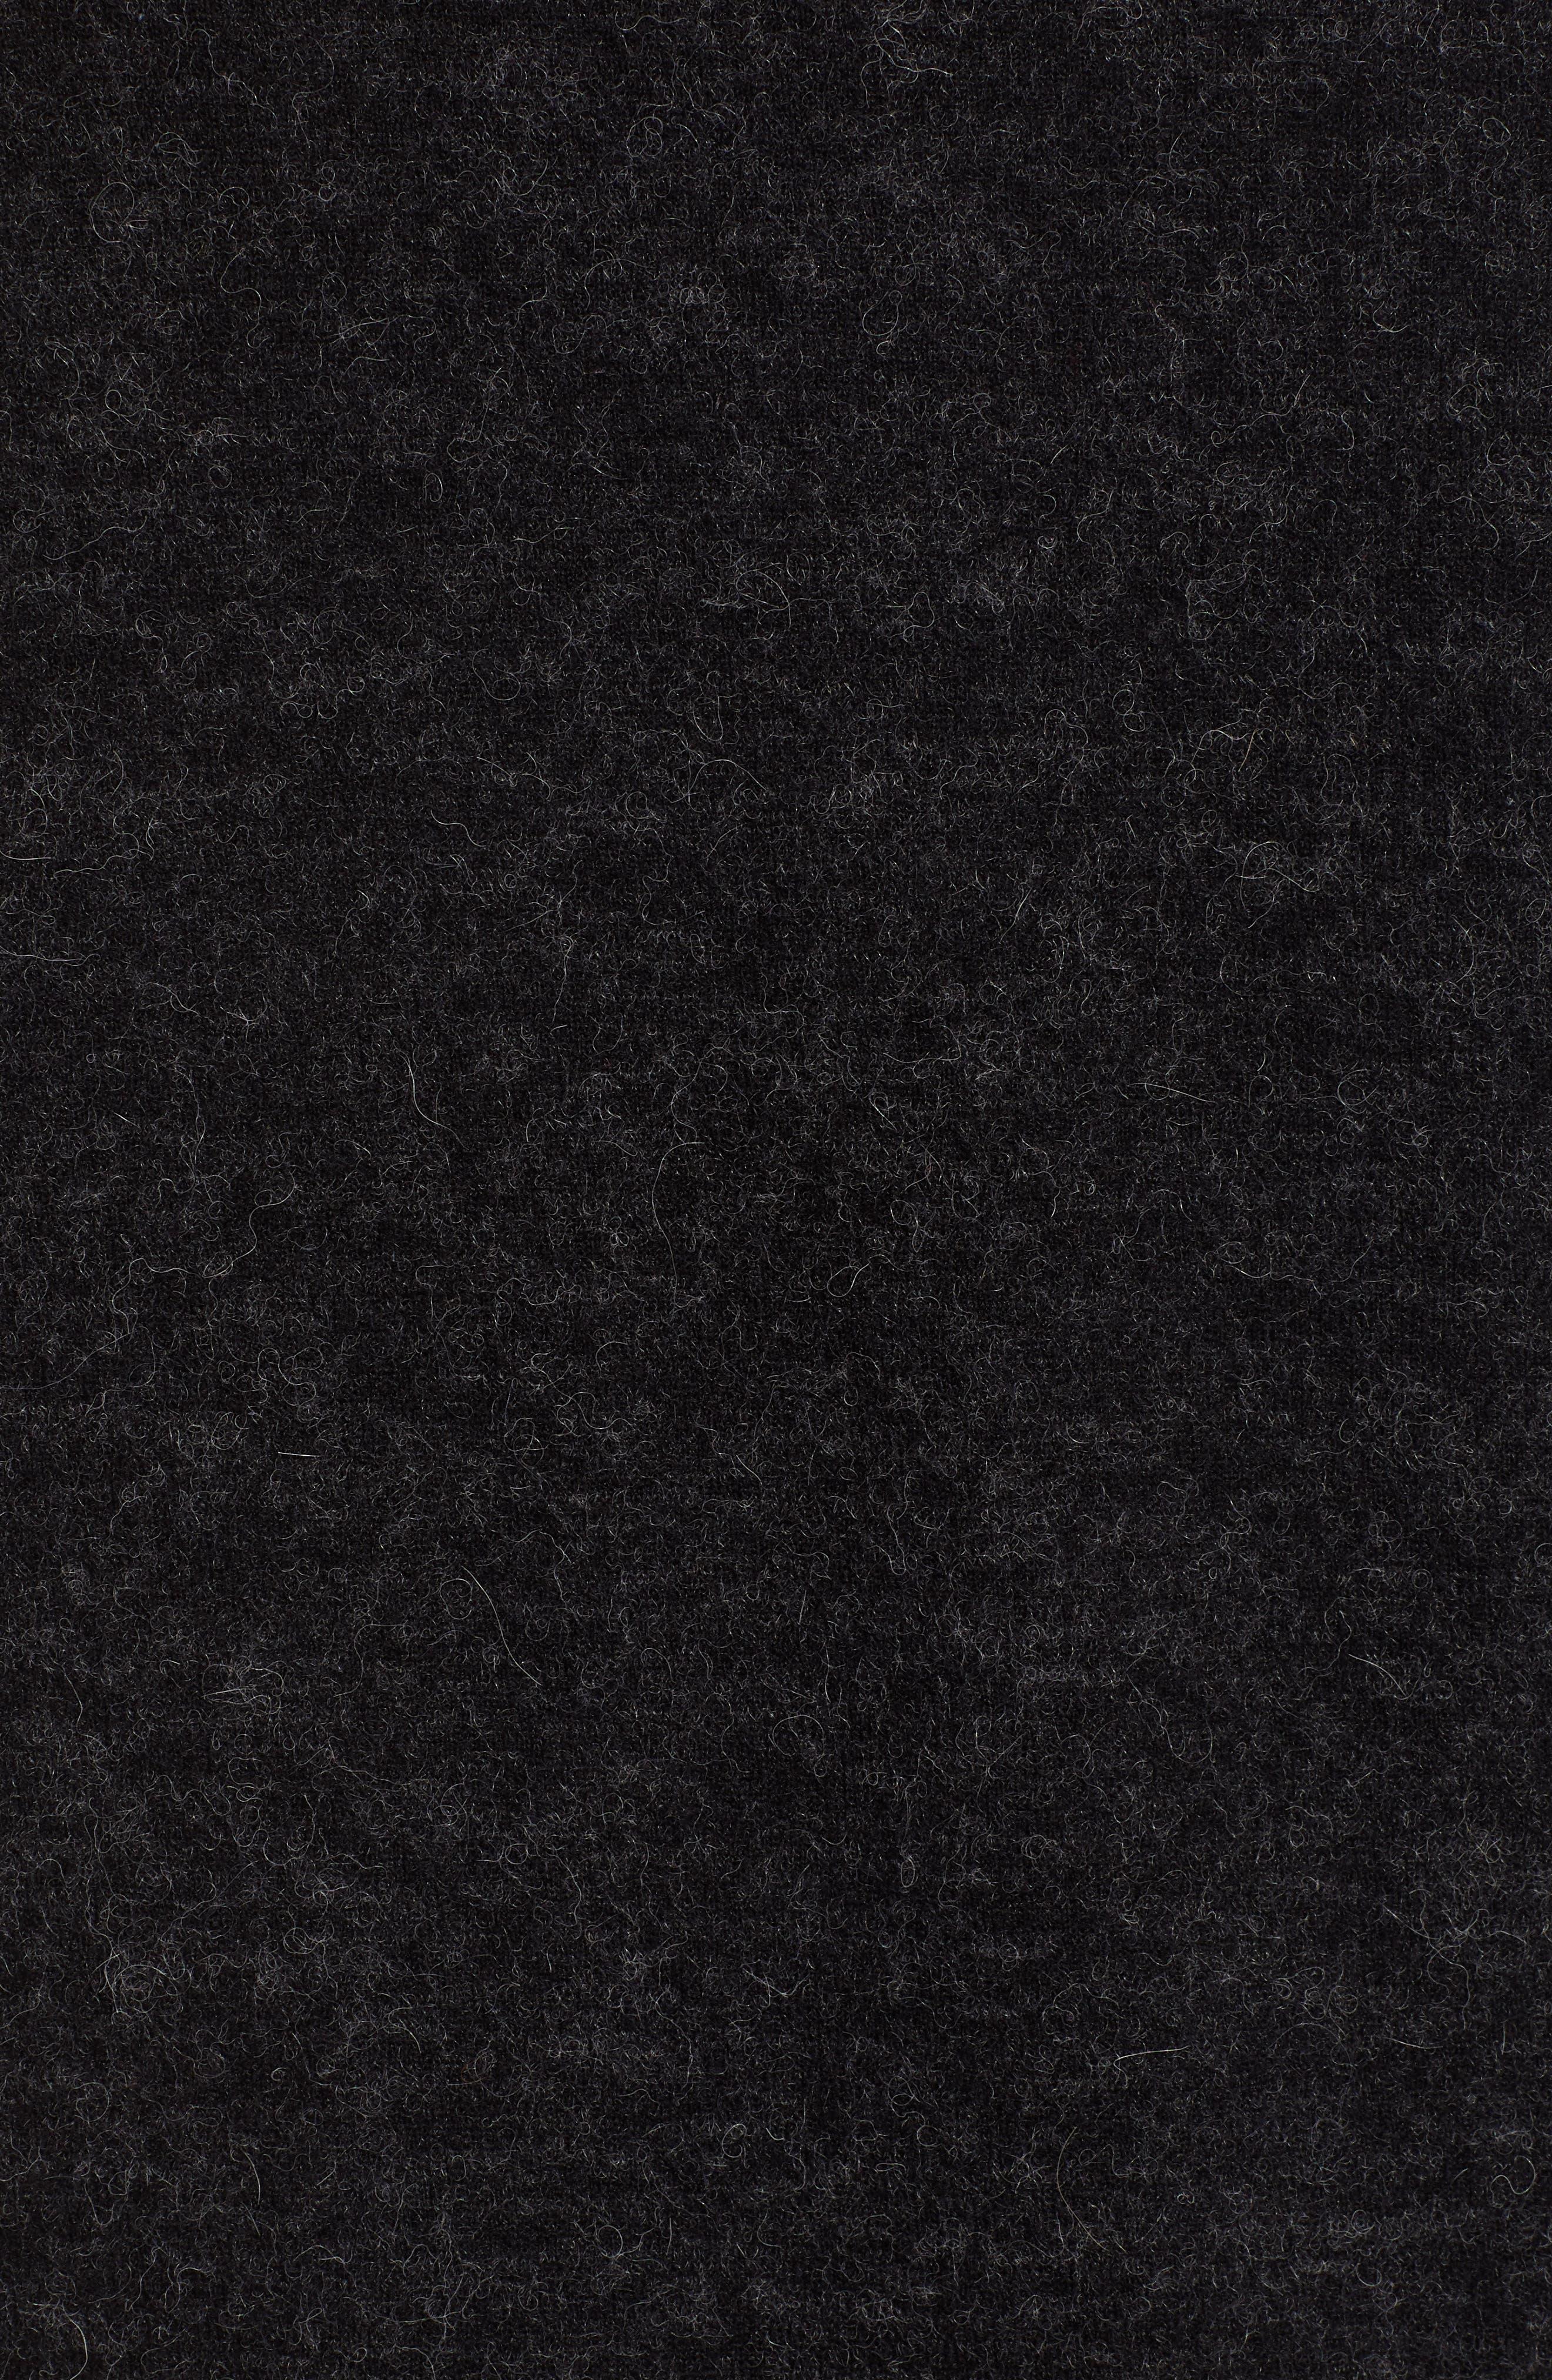 Seridon Oversize Crewneck Sweater,                             Alternate thumbnail 5, color,                             020